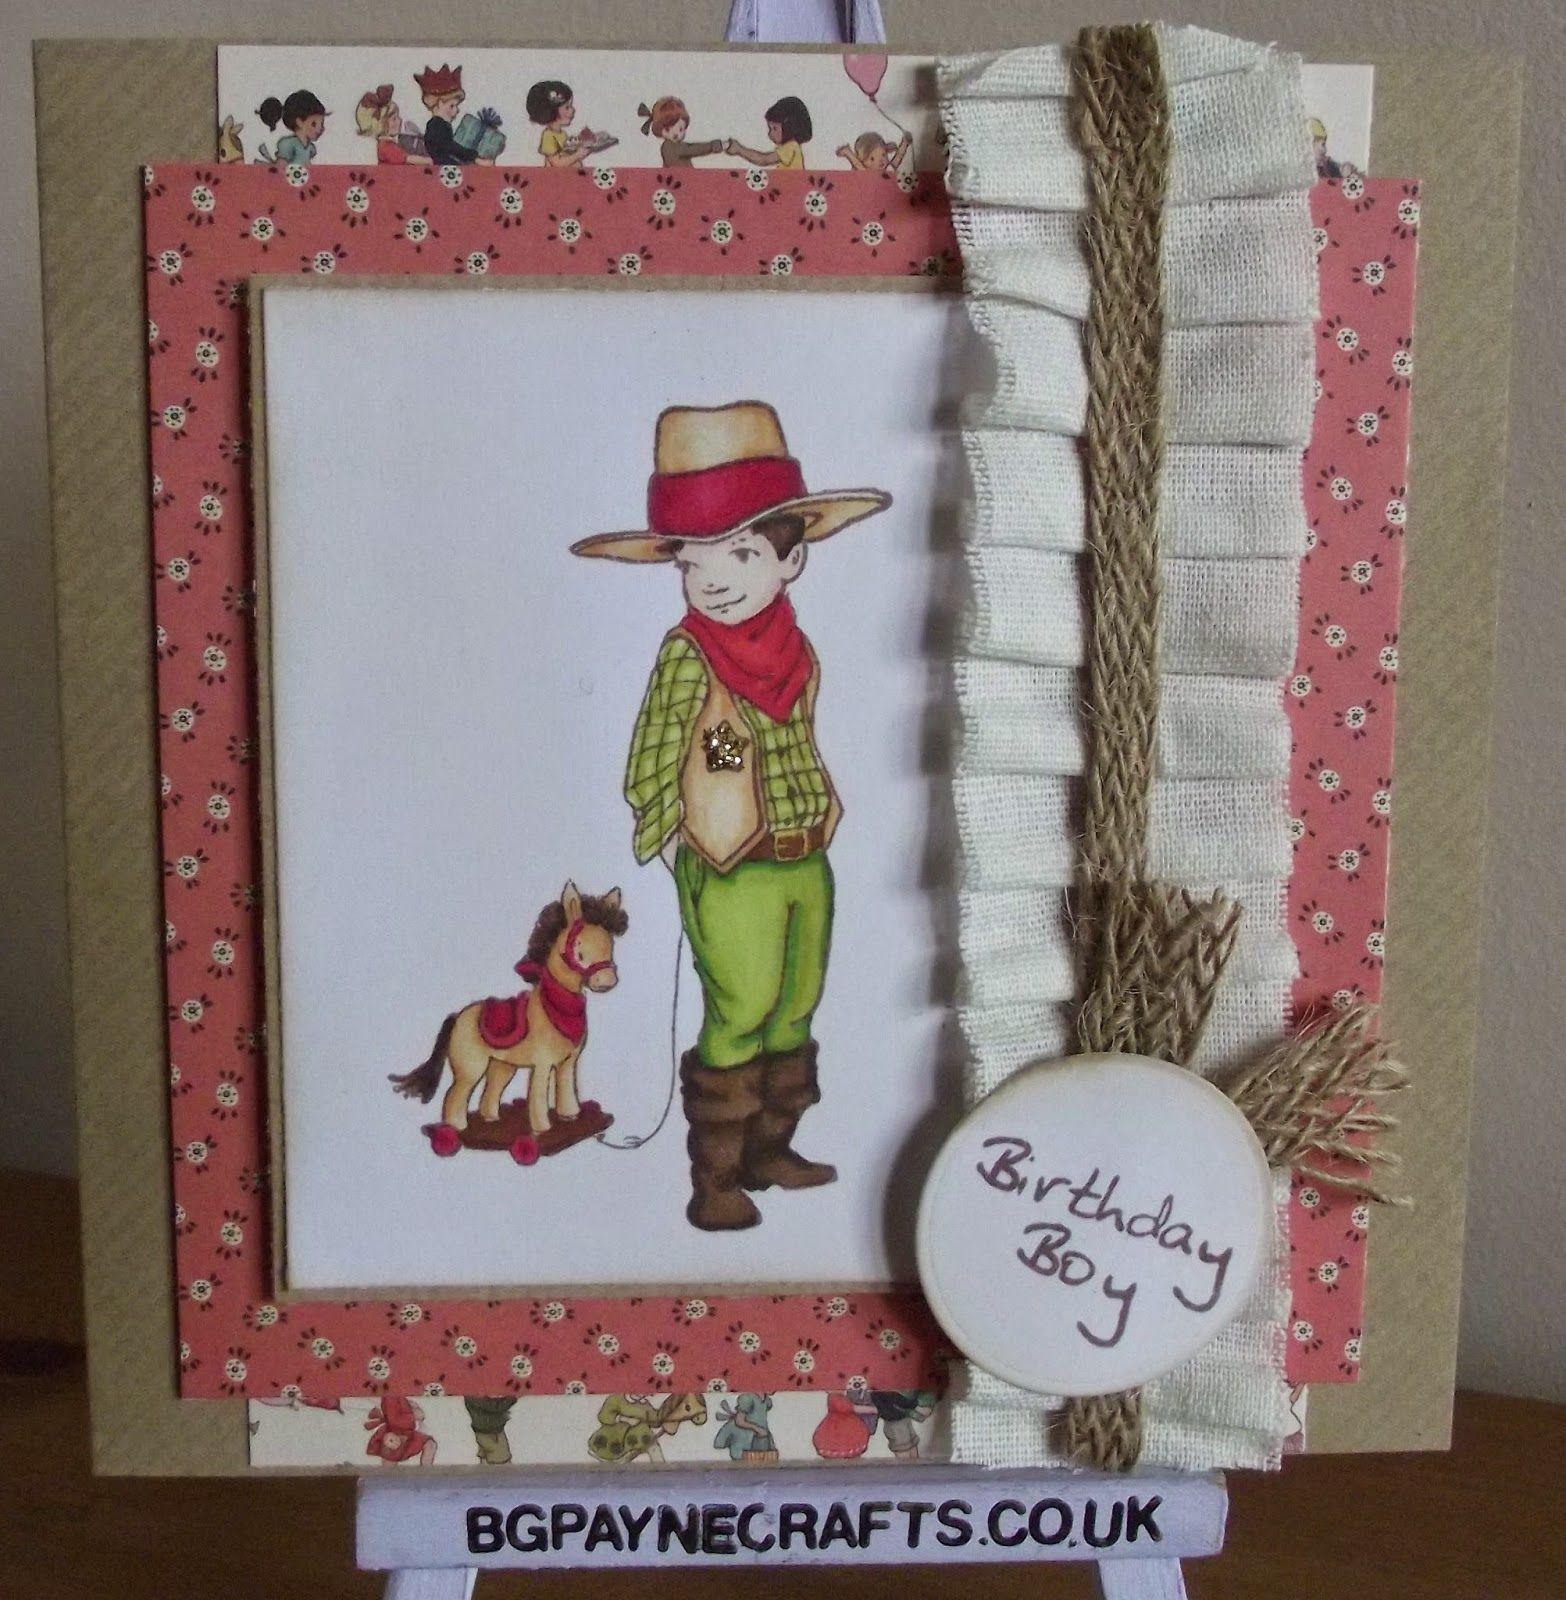 BGPayne Crafts : Belle and Boo Birthday Boy